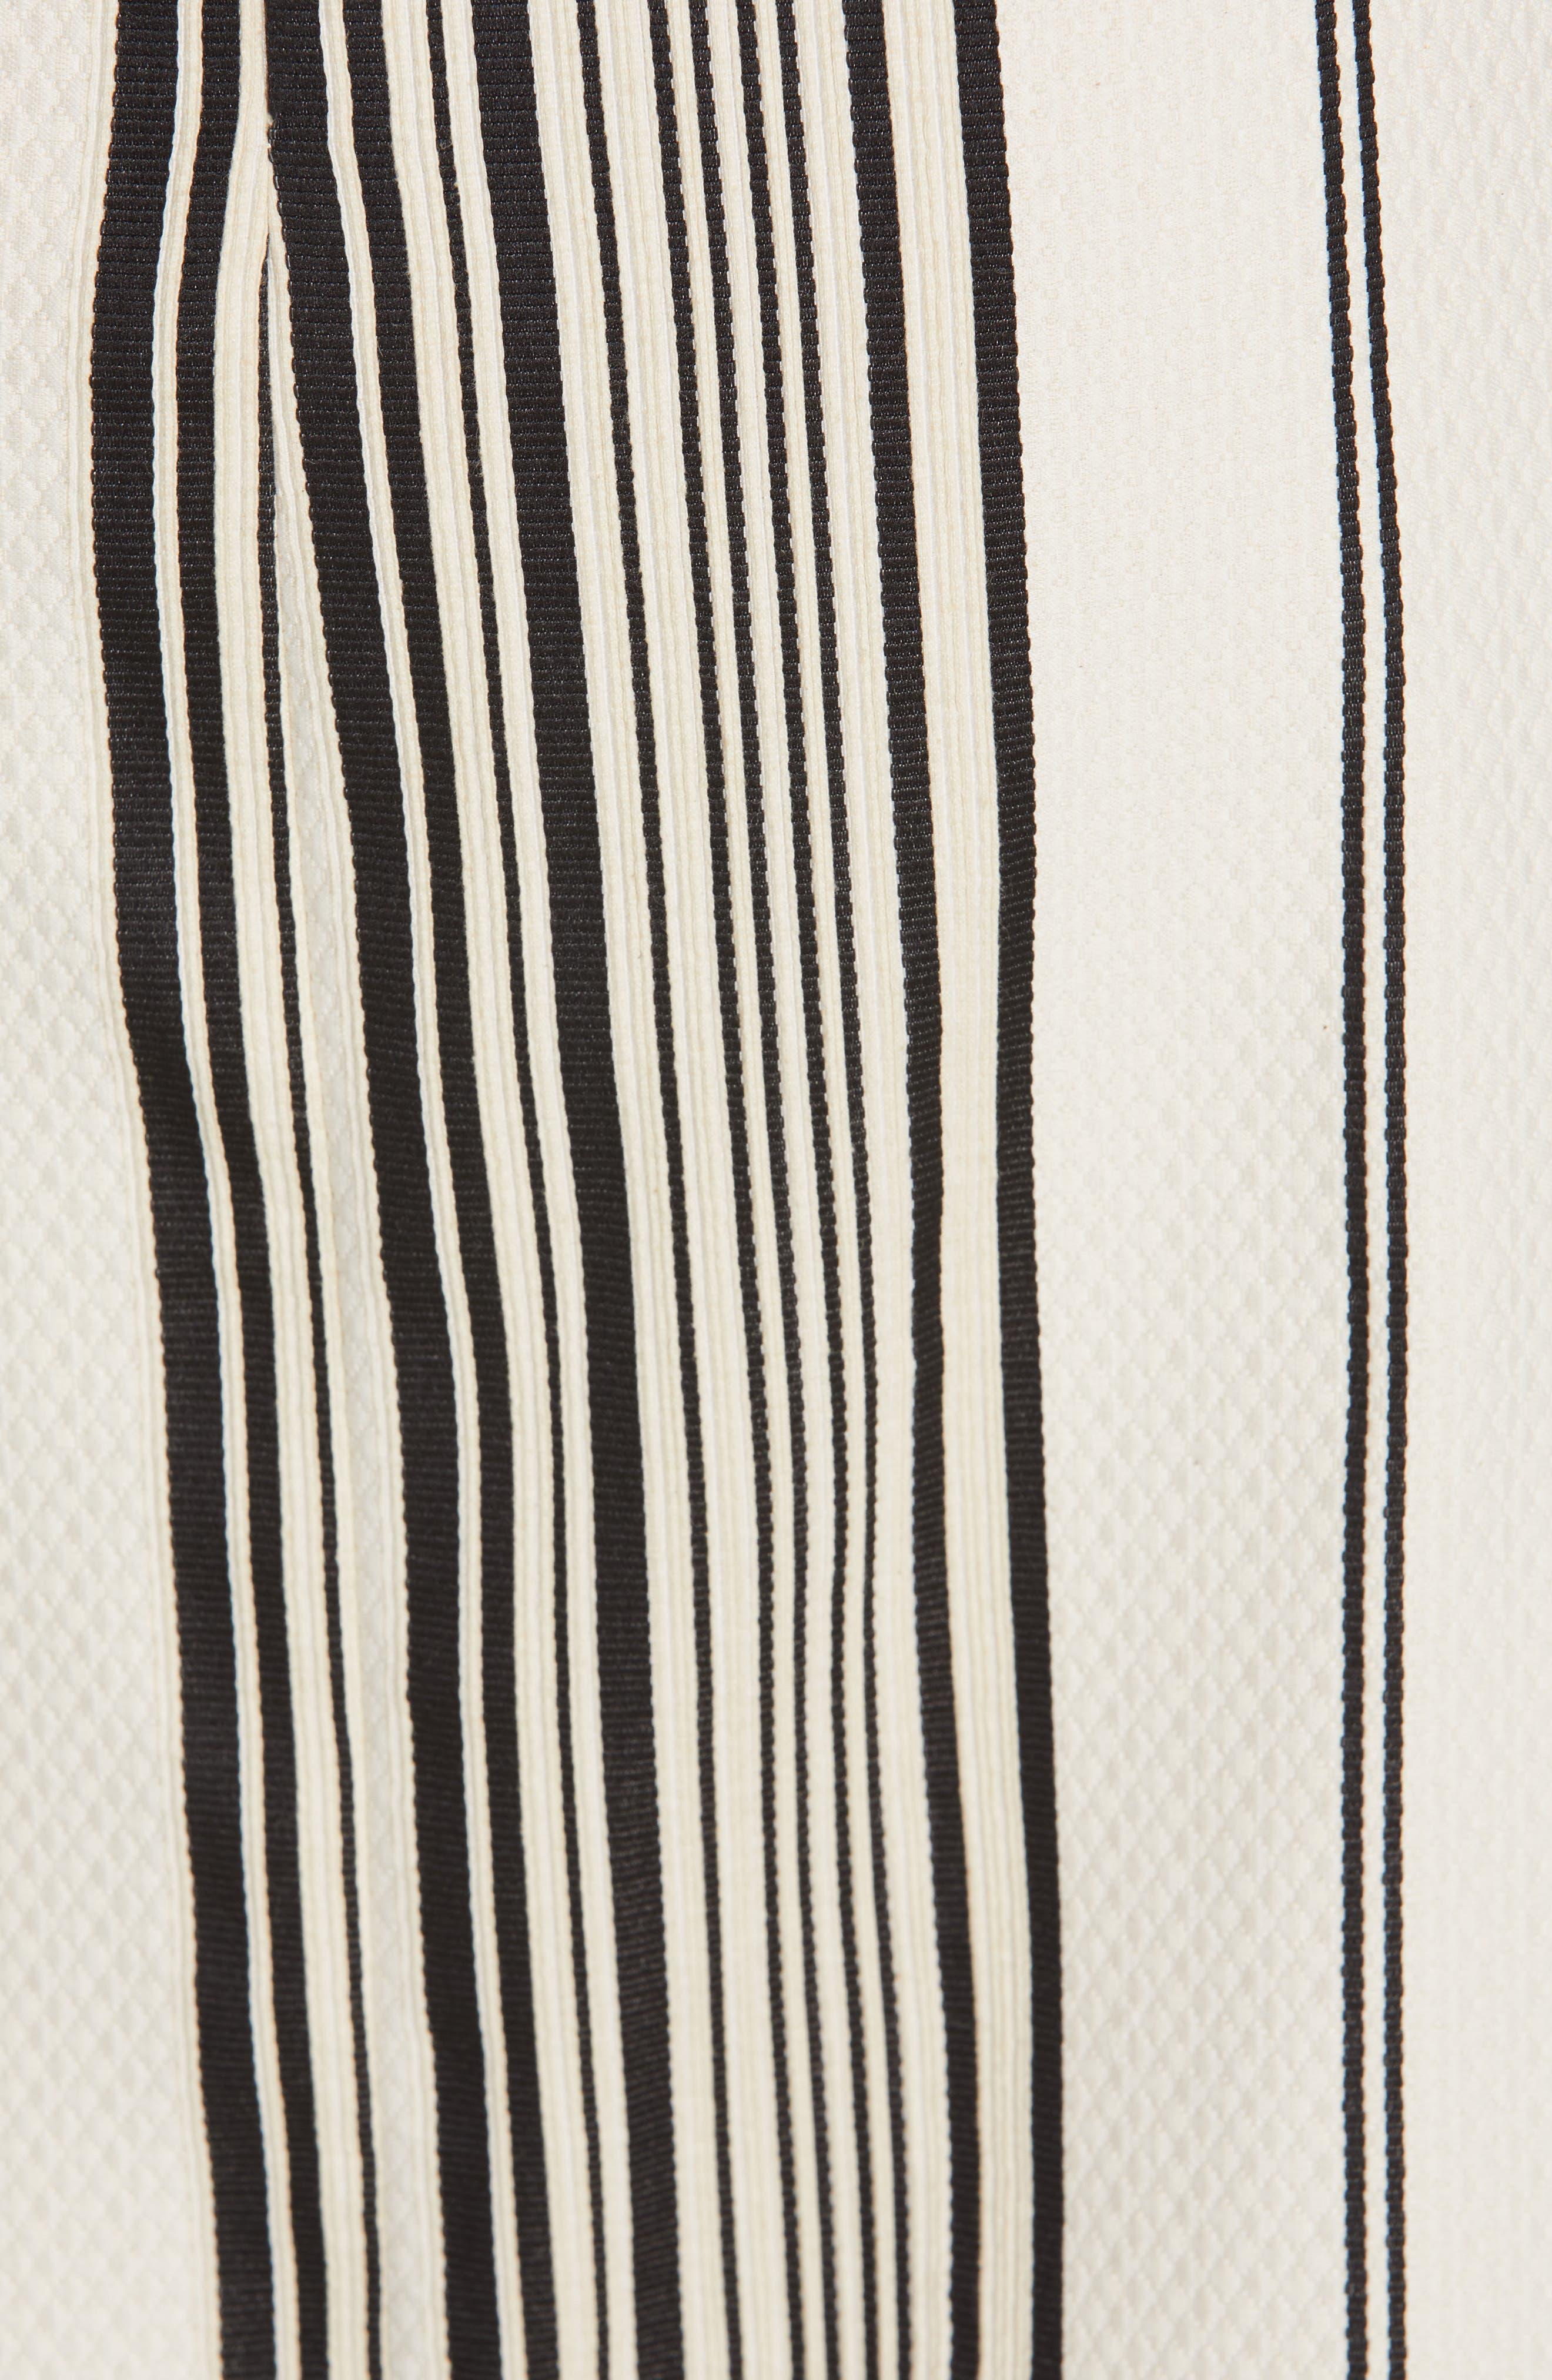 Eve Ero Dress,                             Alternate thumbnail 6, color,                             BLACK/ GREIGE